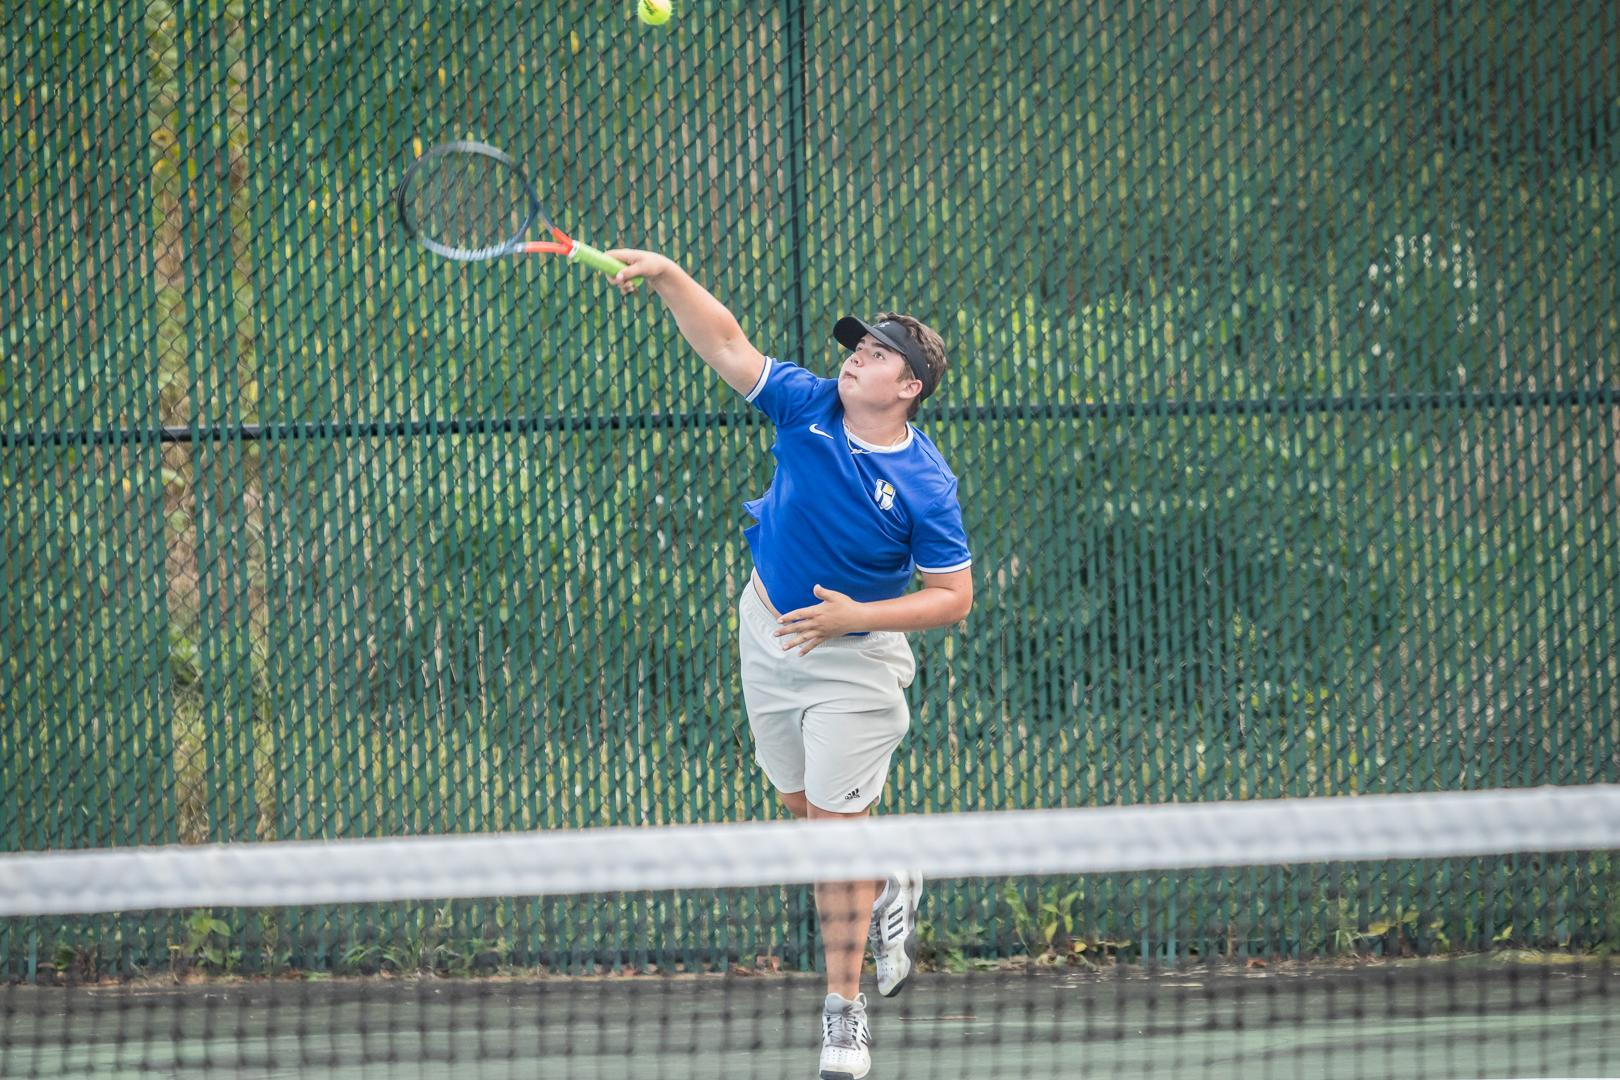 Marian-Boys-Tennis-1634.jpg